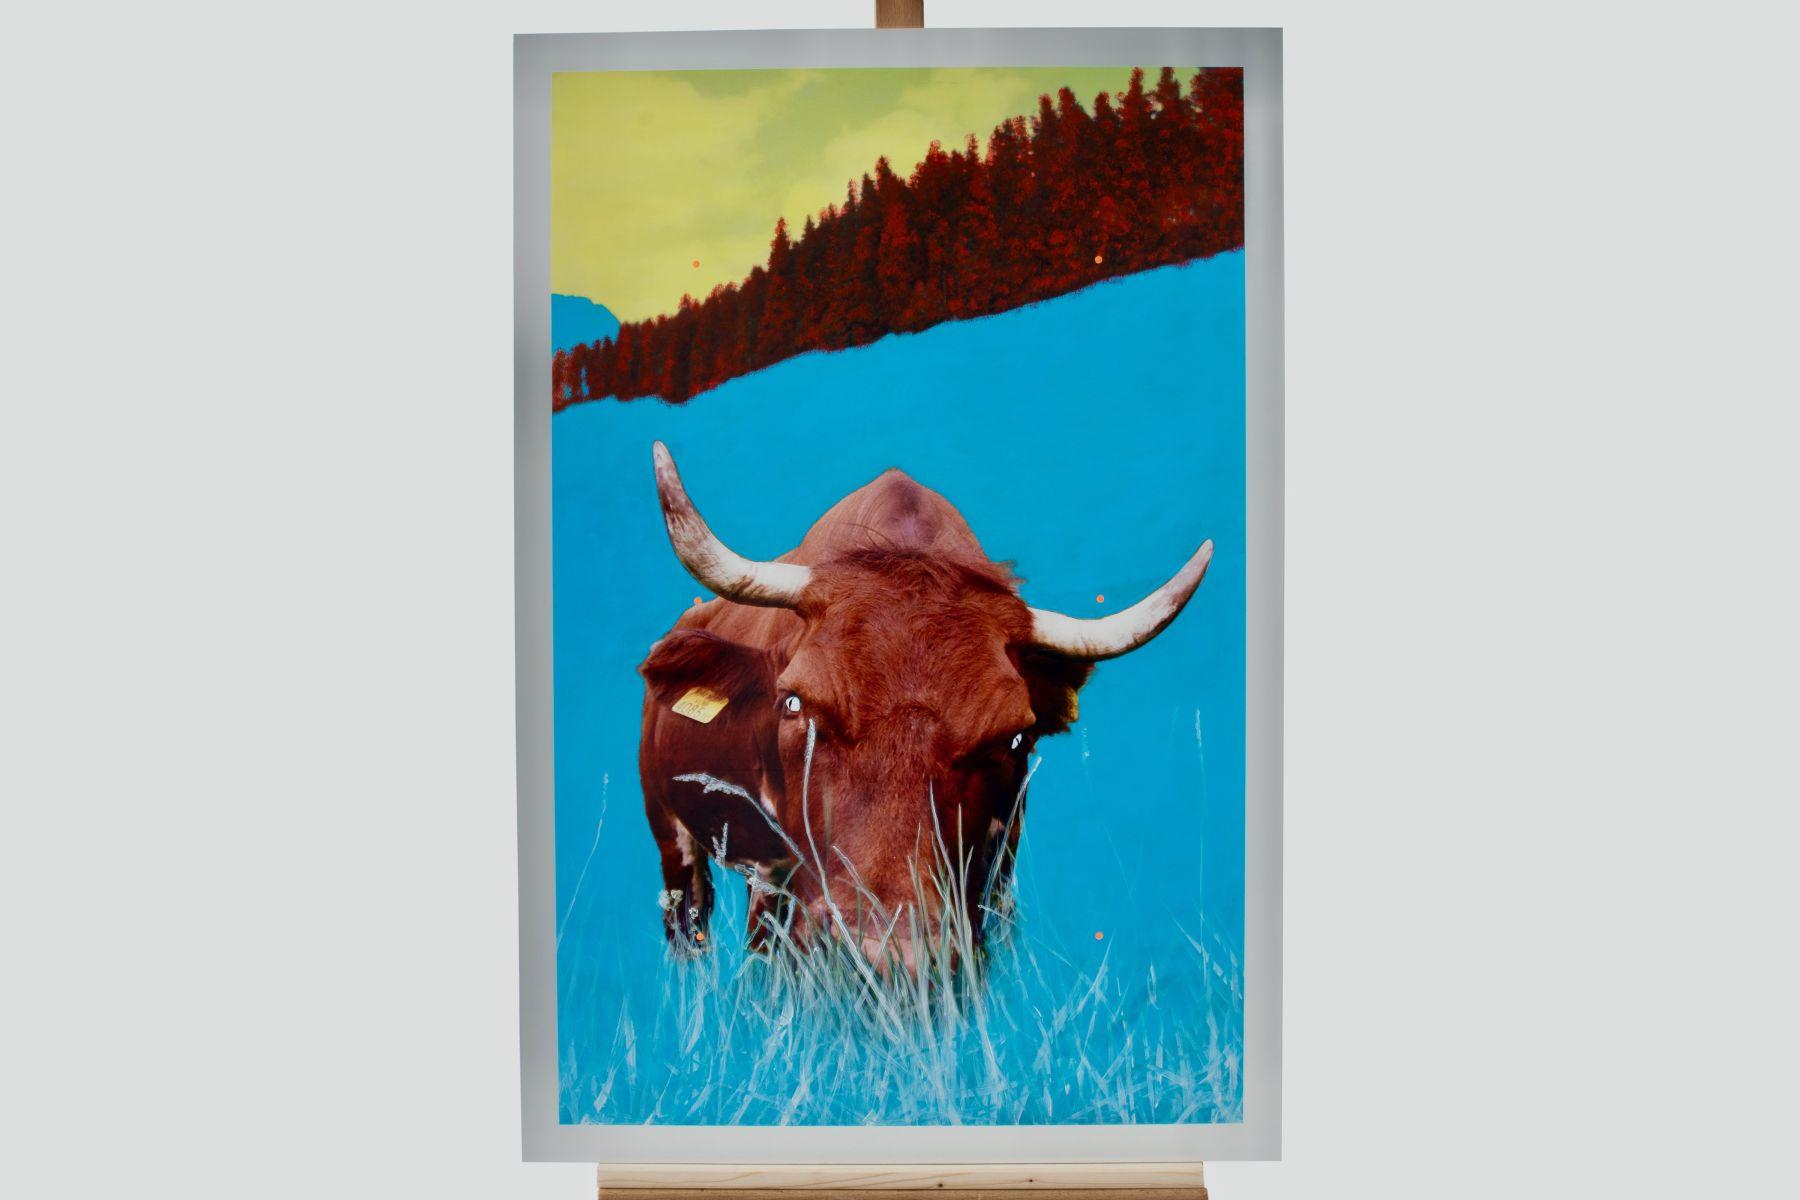 "#92 Stefan Waibel (1970) "" Alpenwarrior"" | Mag. Stefan Waibl (1970) ""Alpenwarrior"" Image"